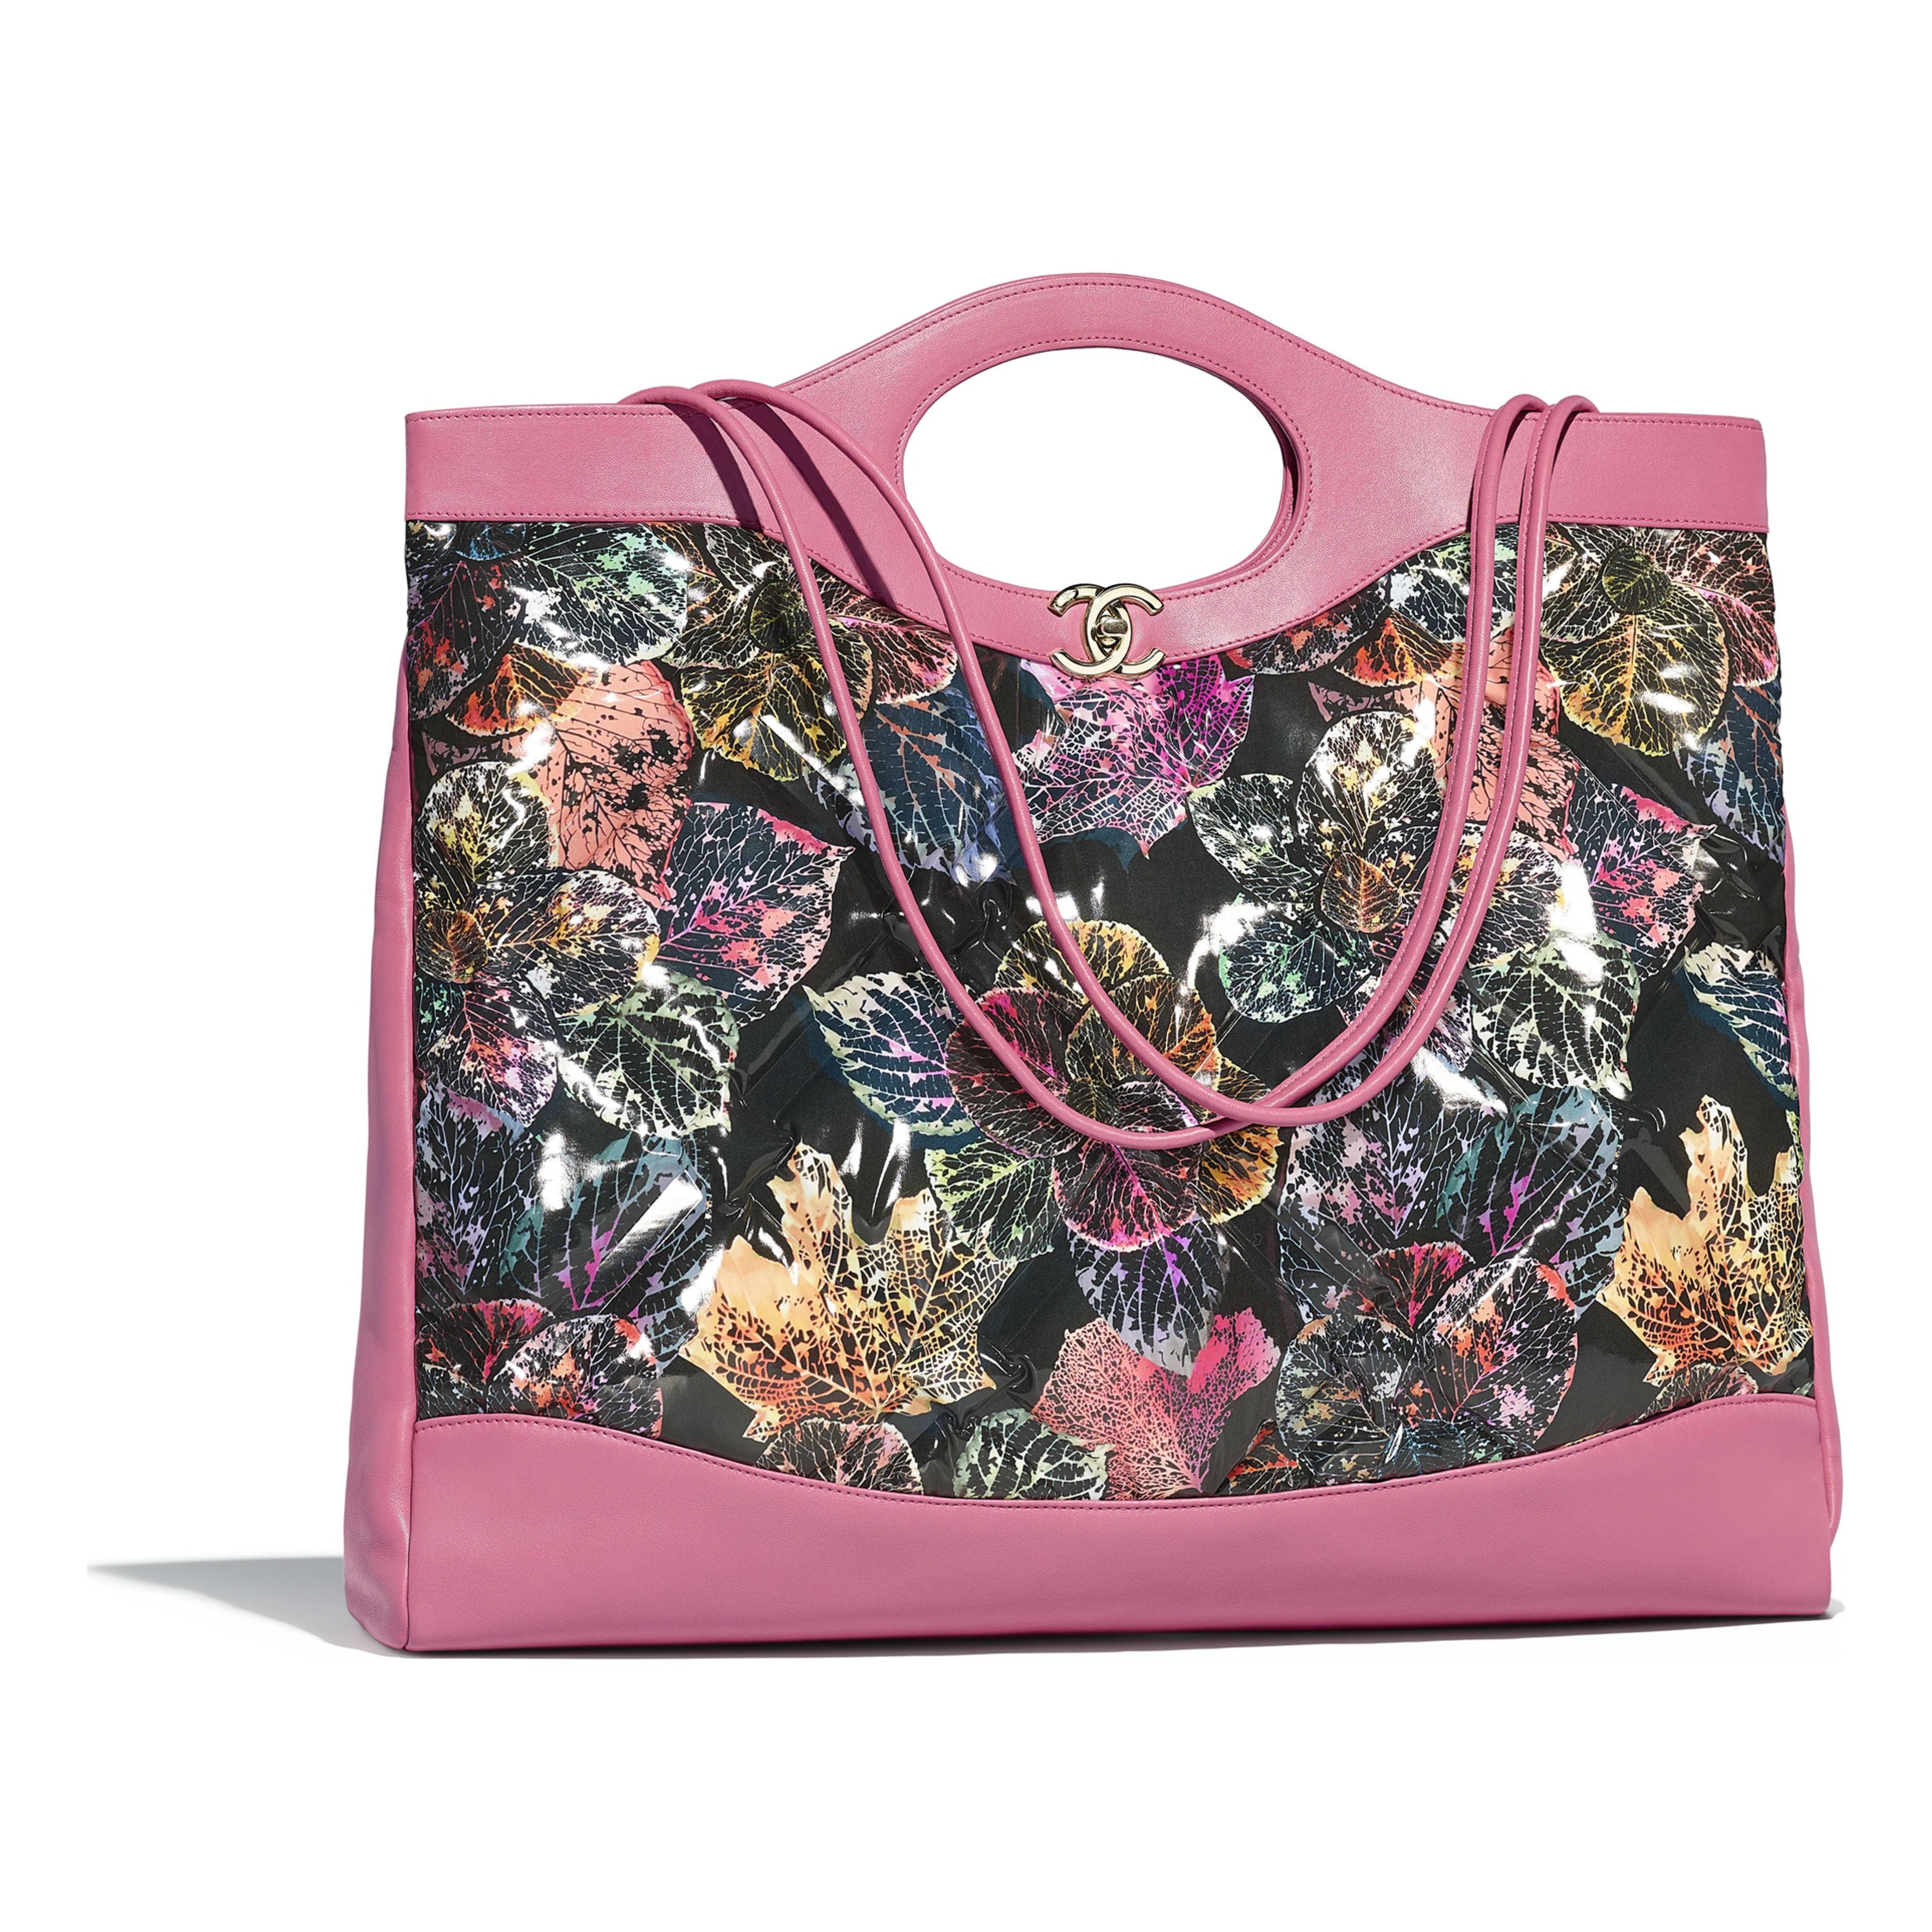 Chanel 31 Large Ping Bag